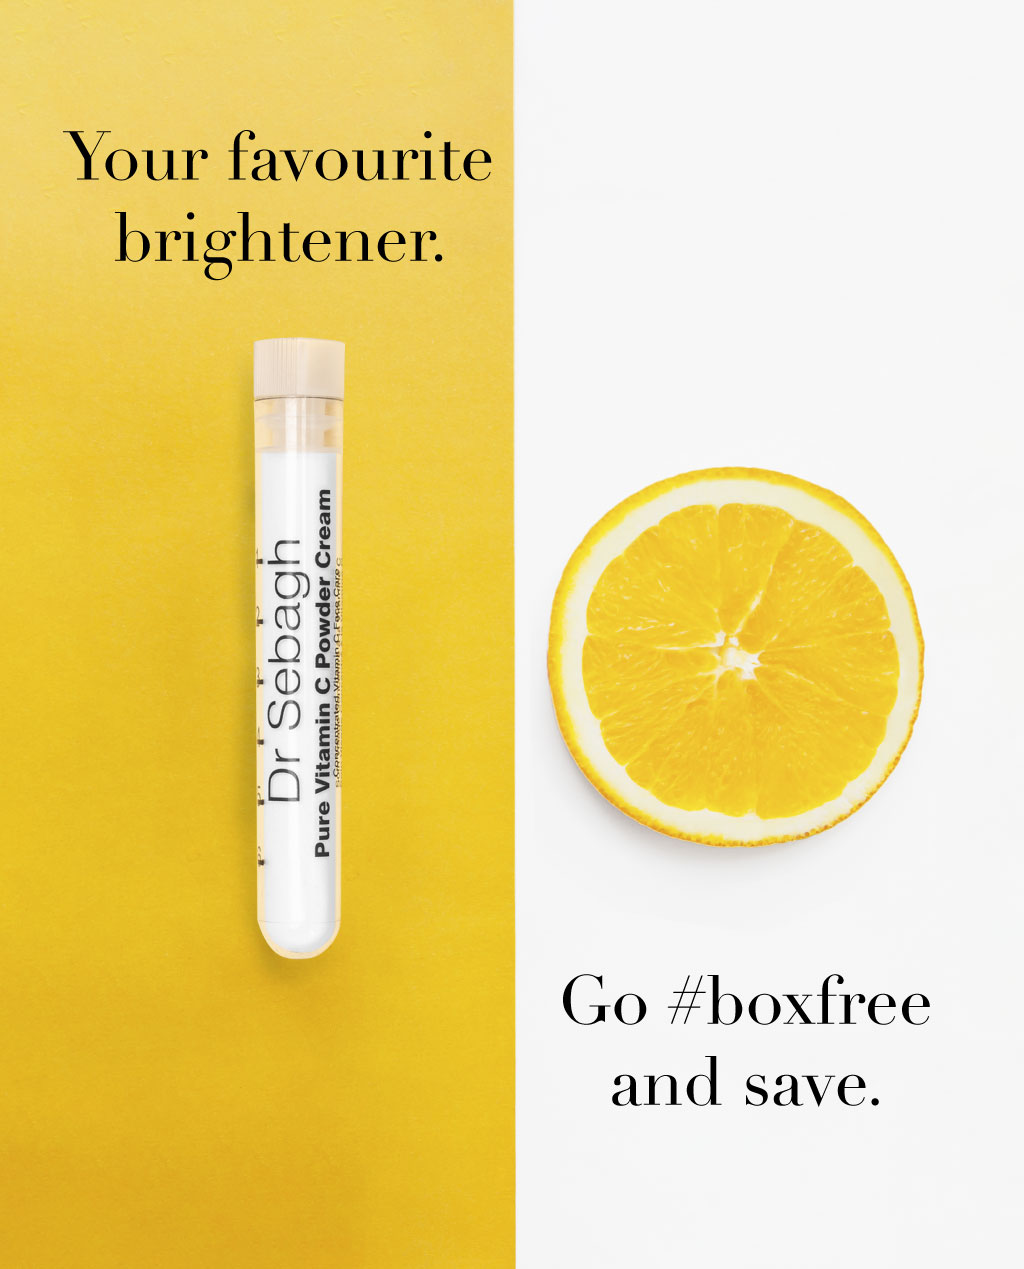 Dr Sebagh Pure Vitamin C Powder Cream